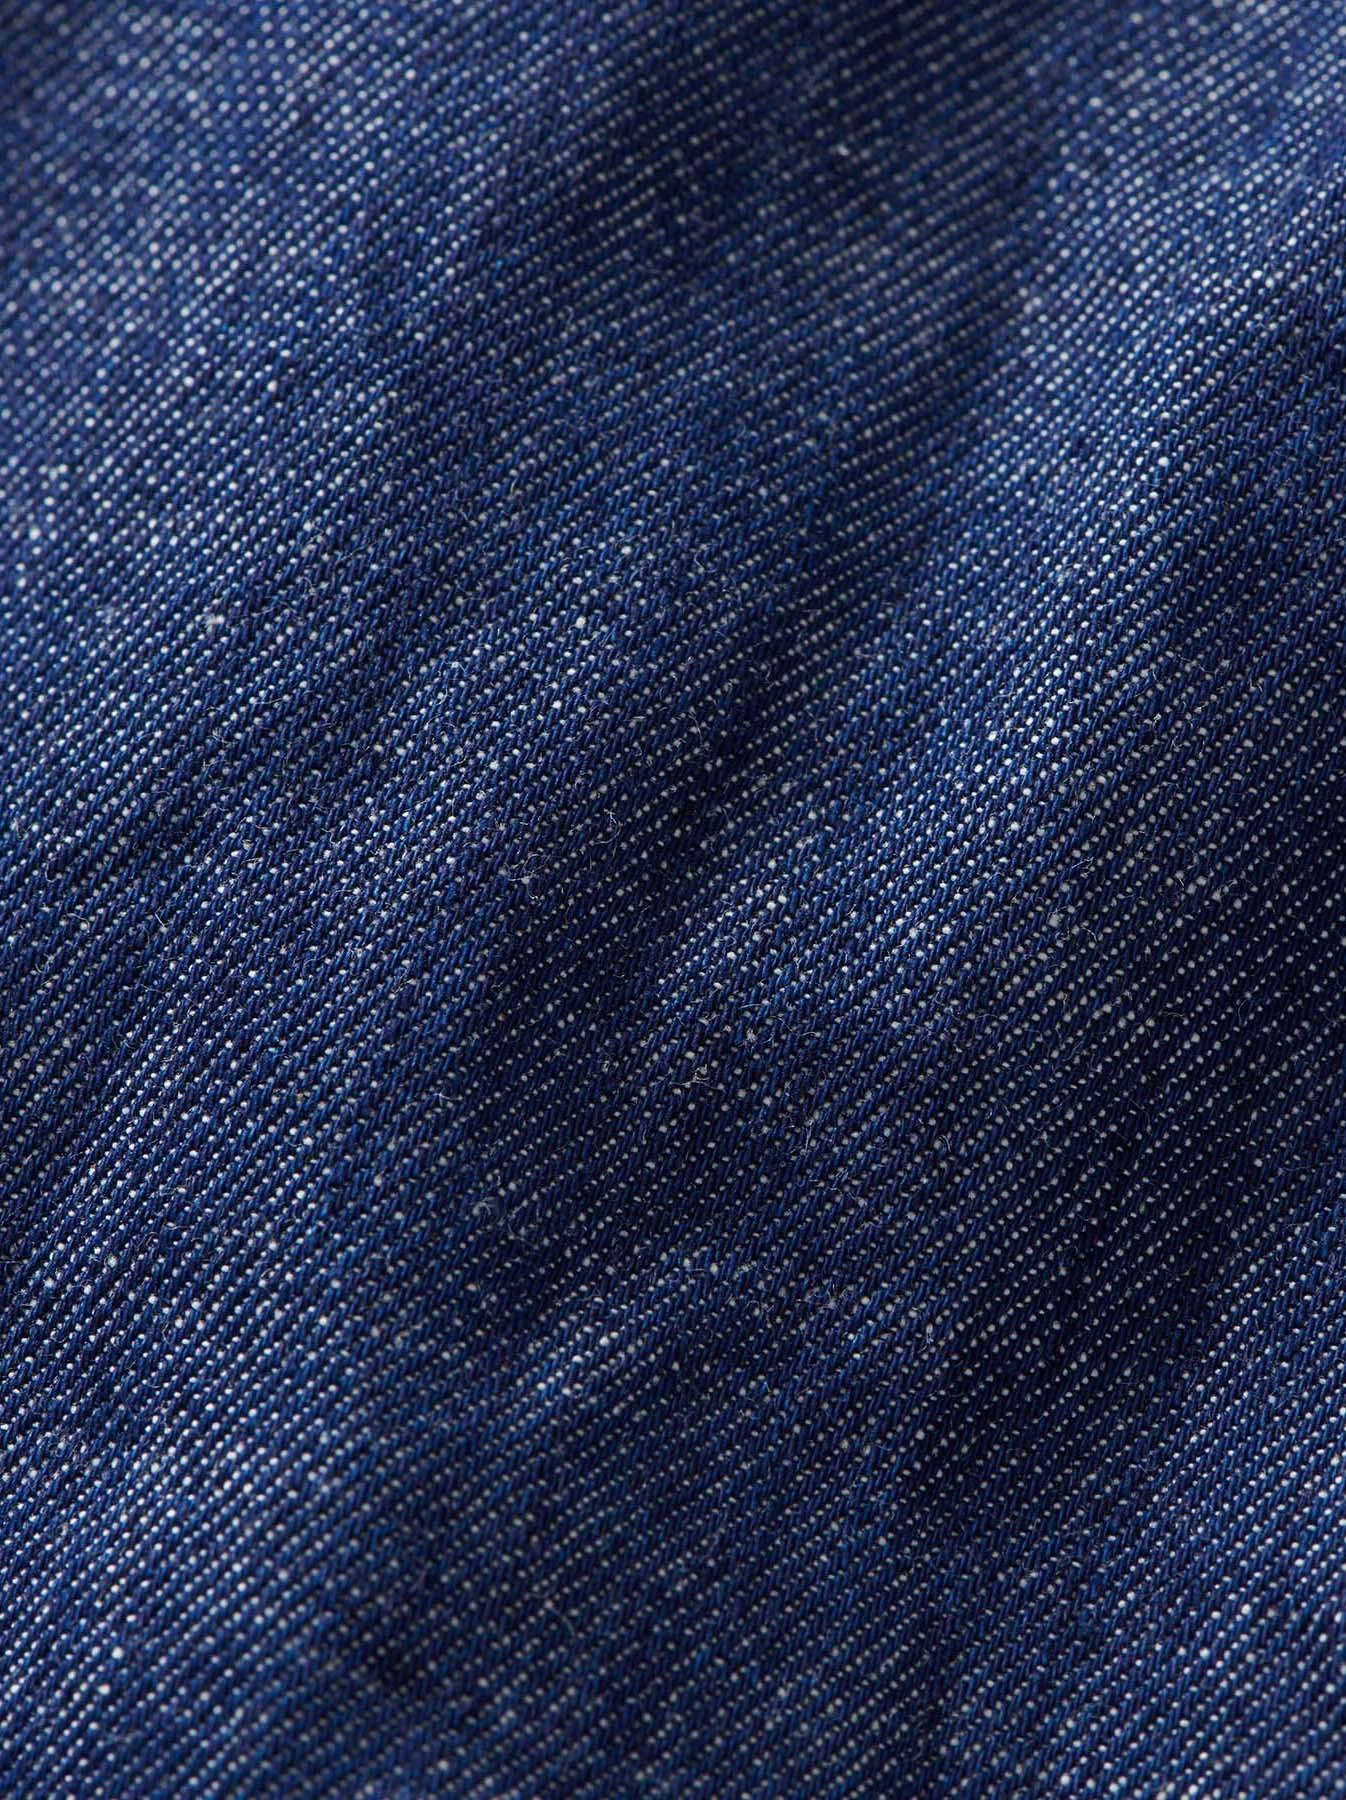 Goma Denim Stand Collar Eastern Shirt-12